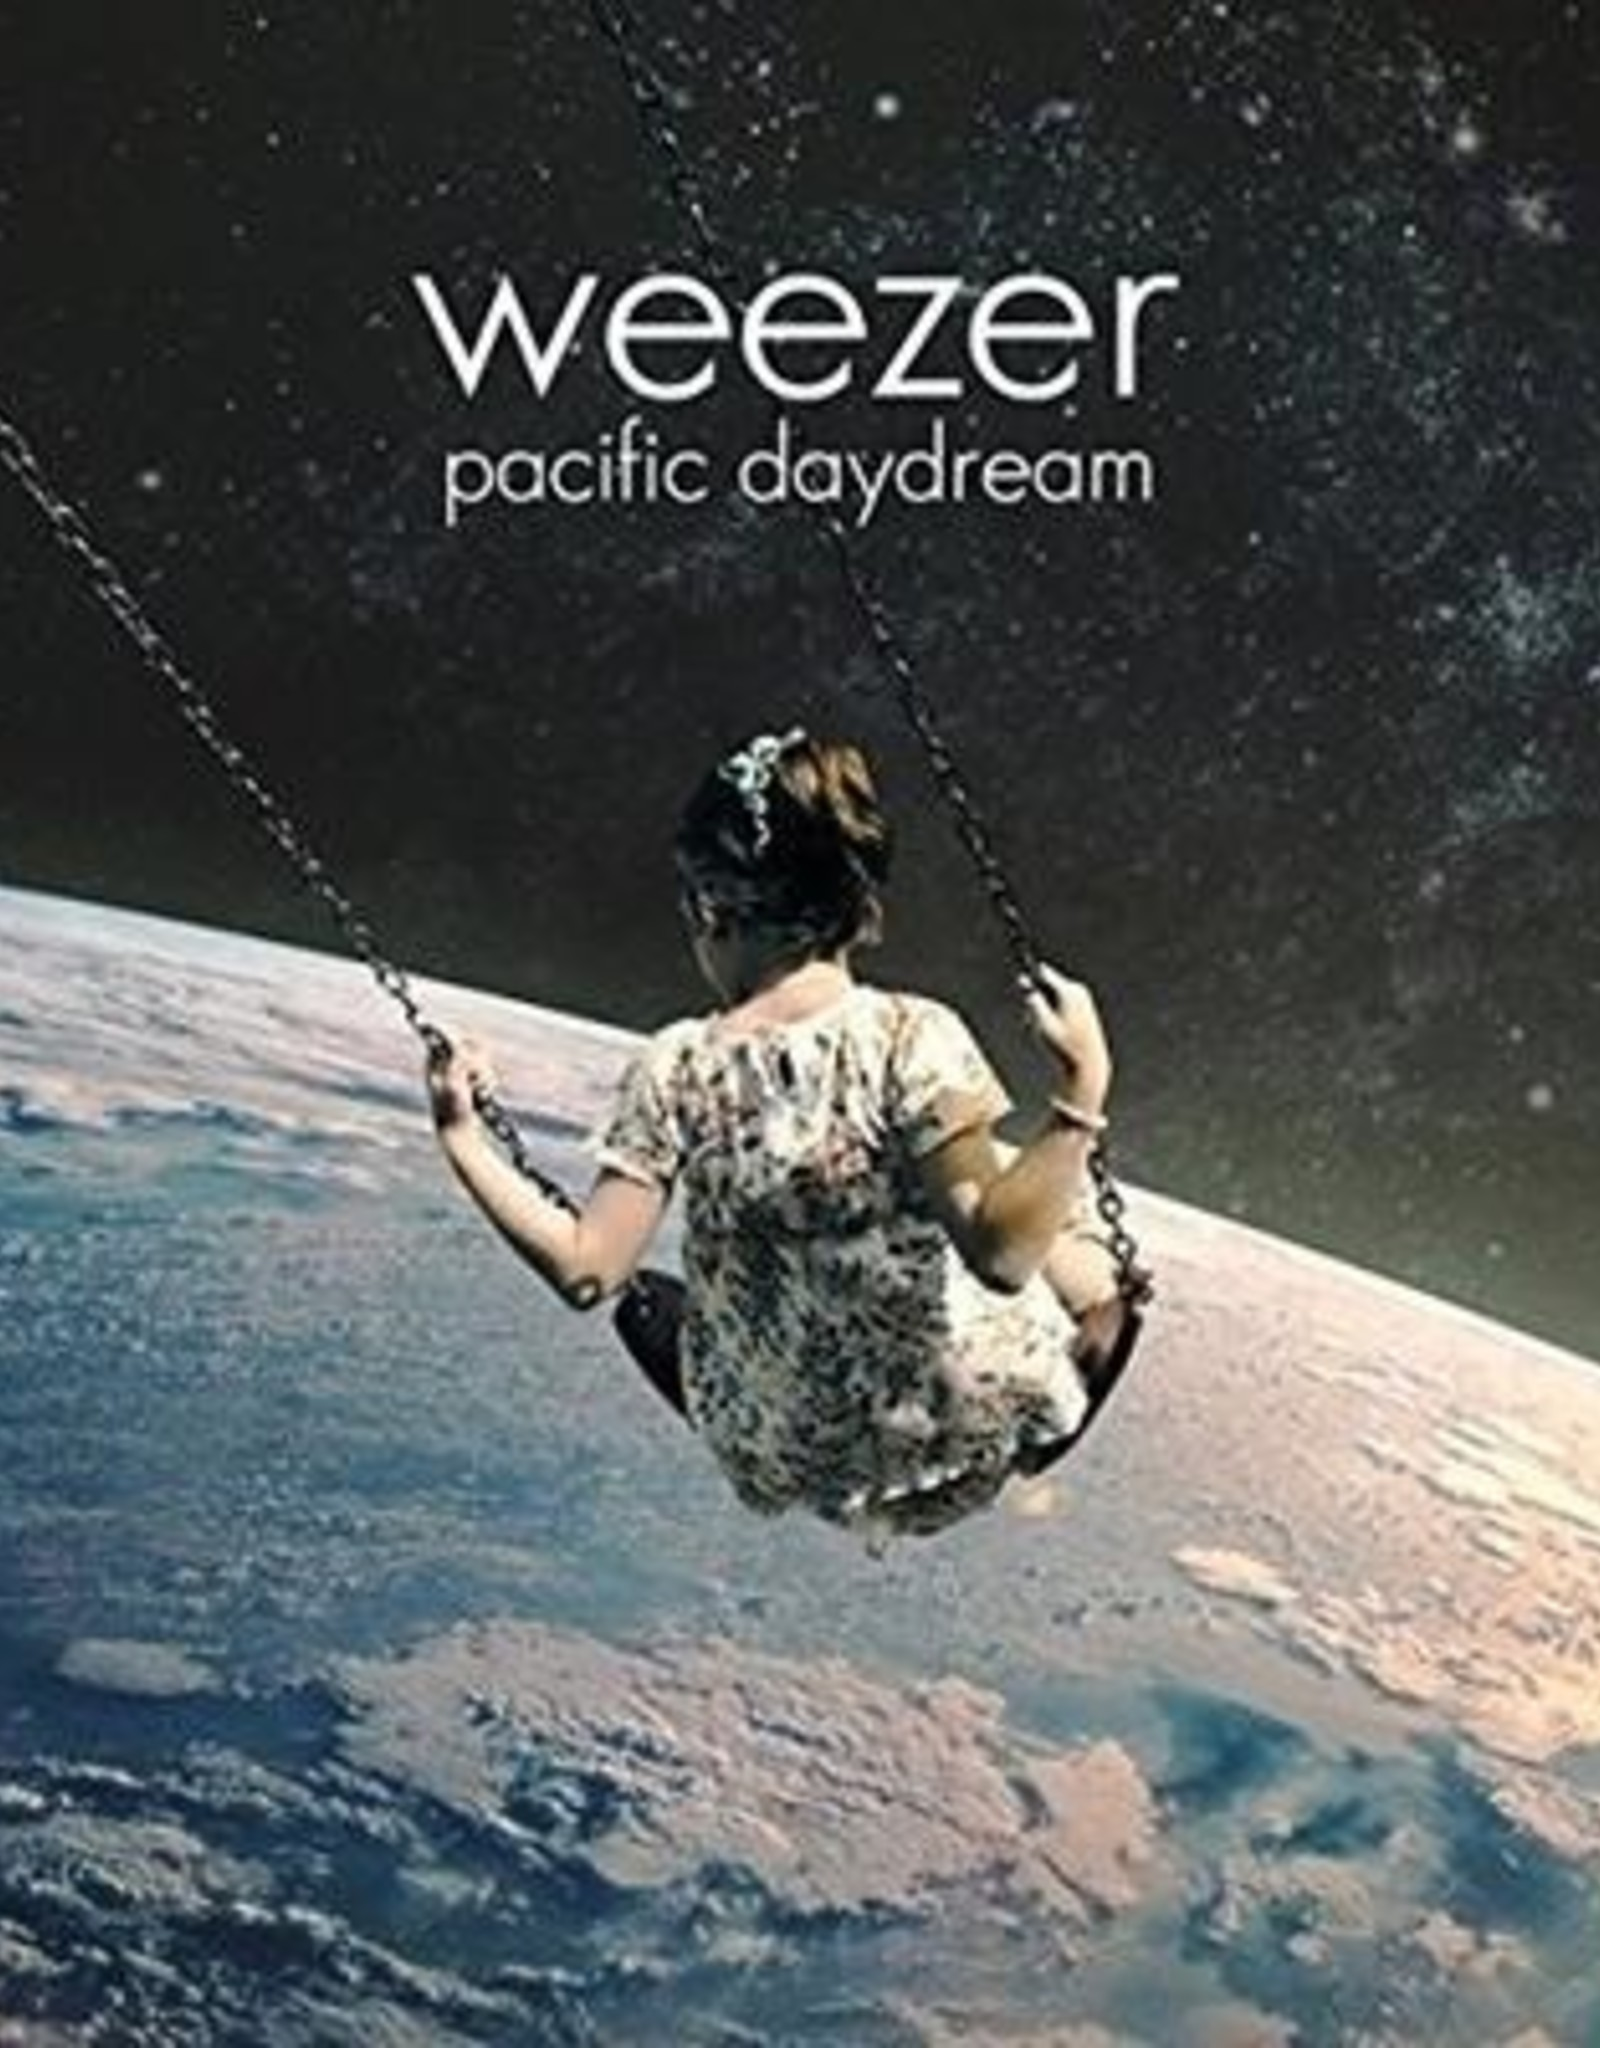 Weezer - Pacific Daydream (Vinyl W/Digital Download)